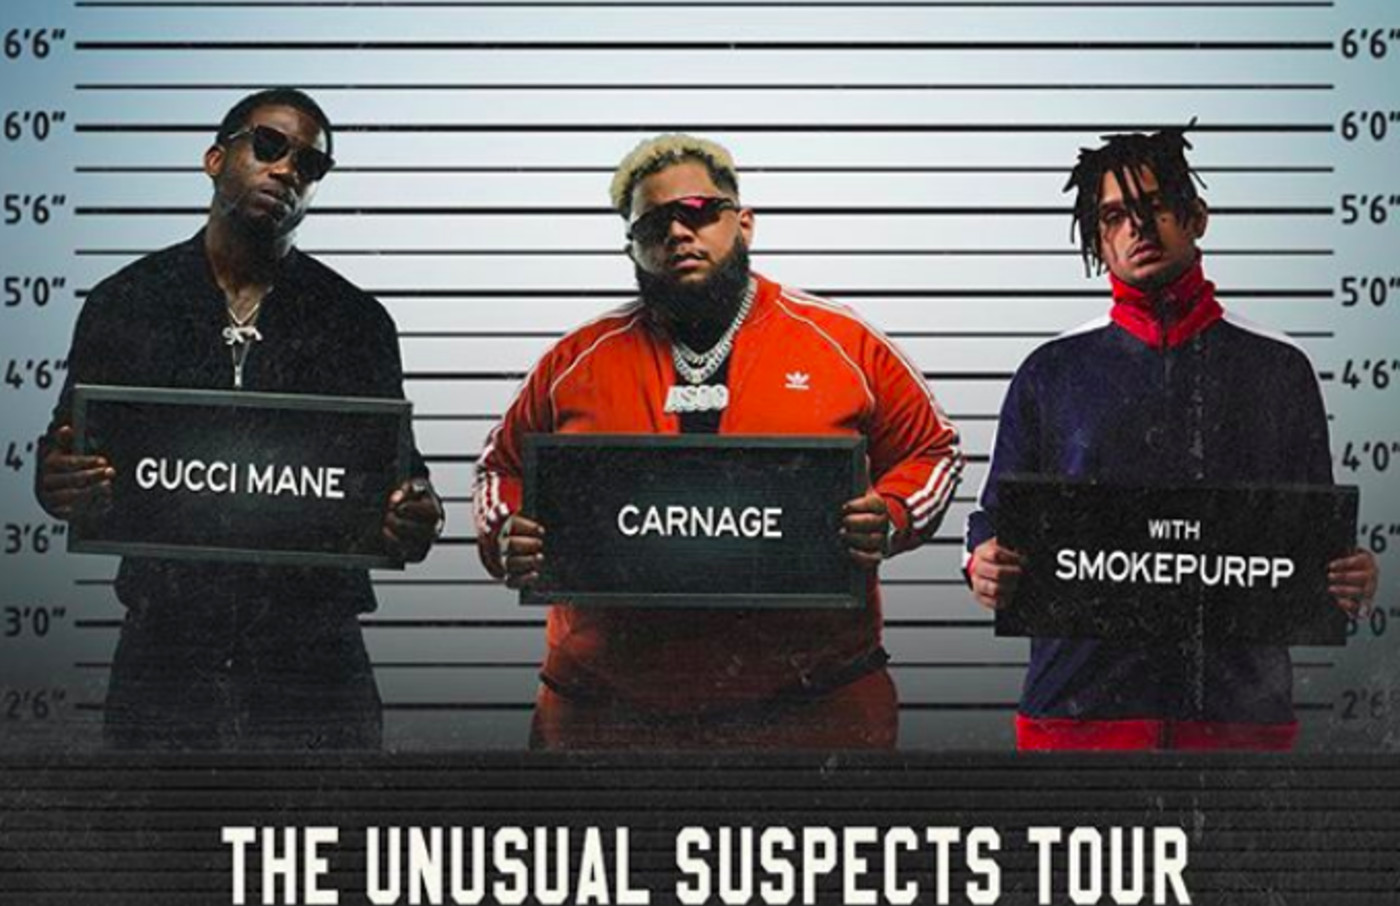 Unusual Suspects Tour